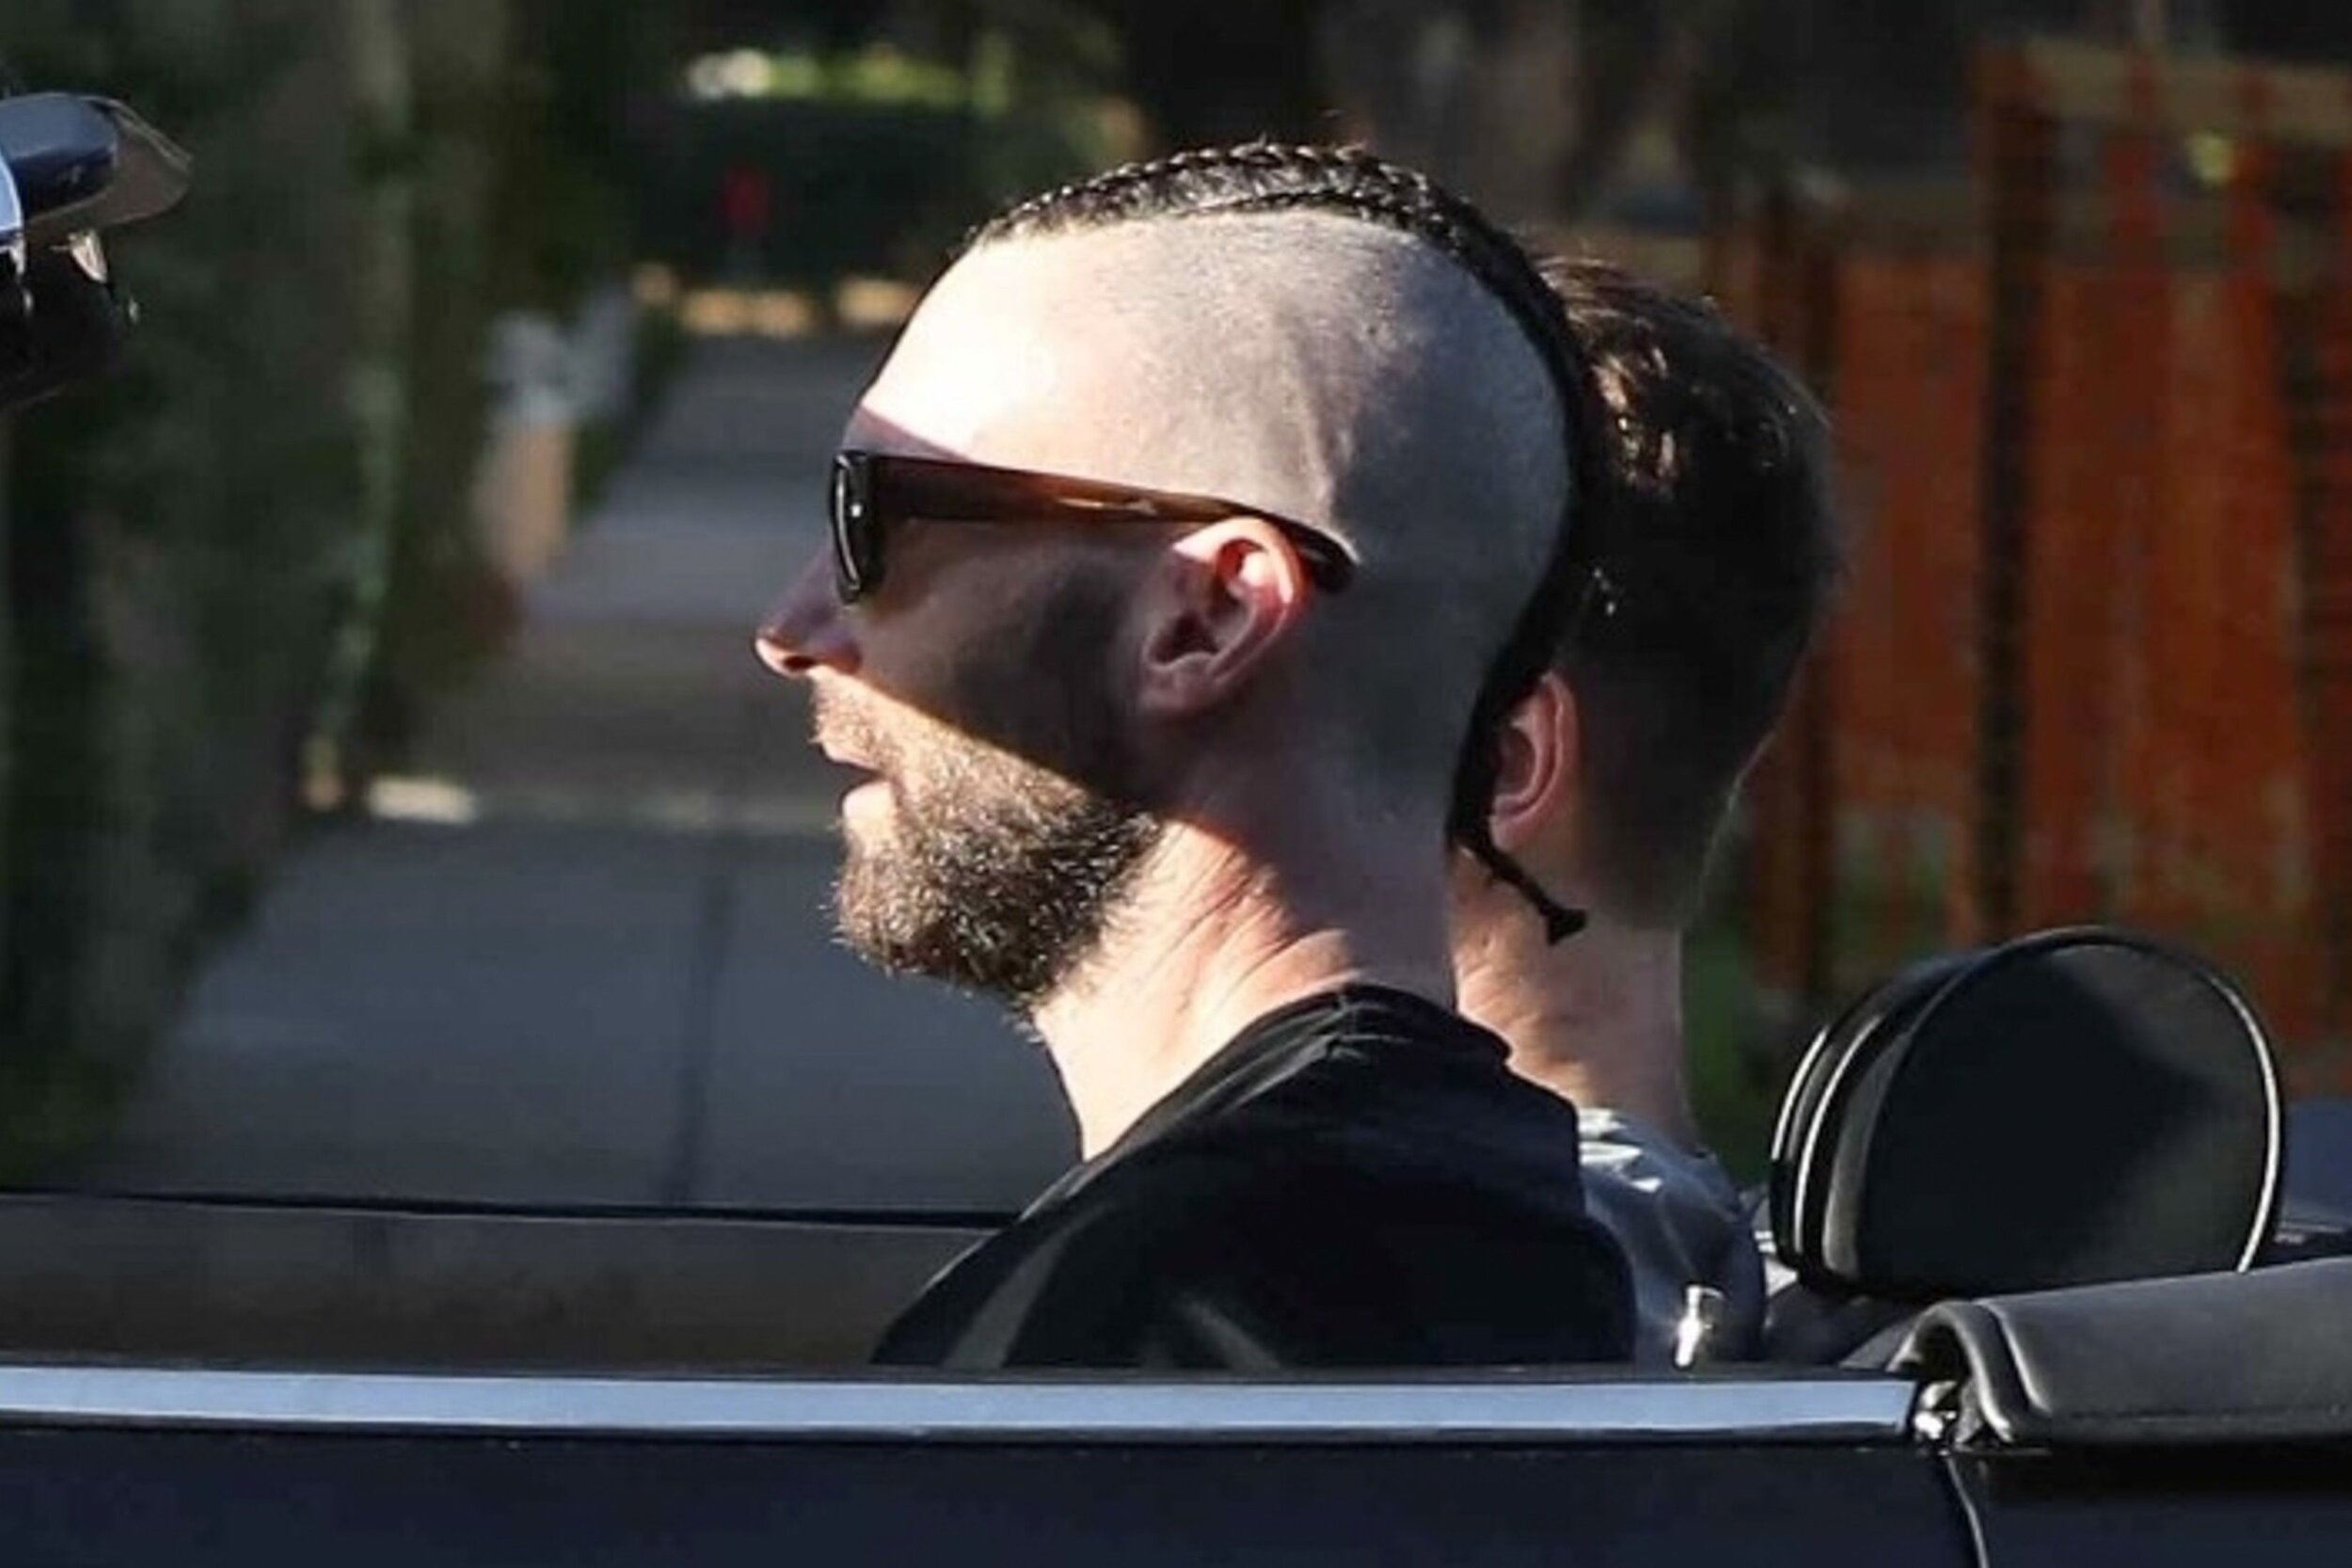 adam-levine-cornhawk-hair-1569600944.jpg